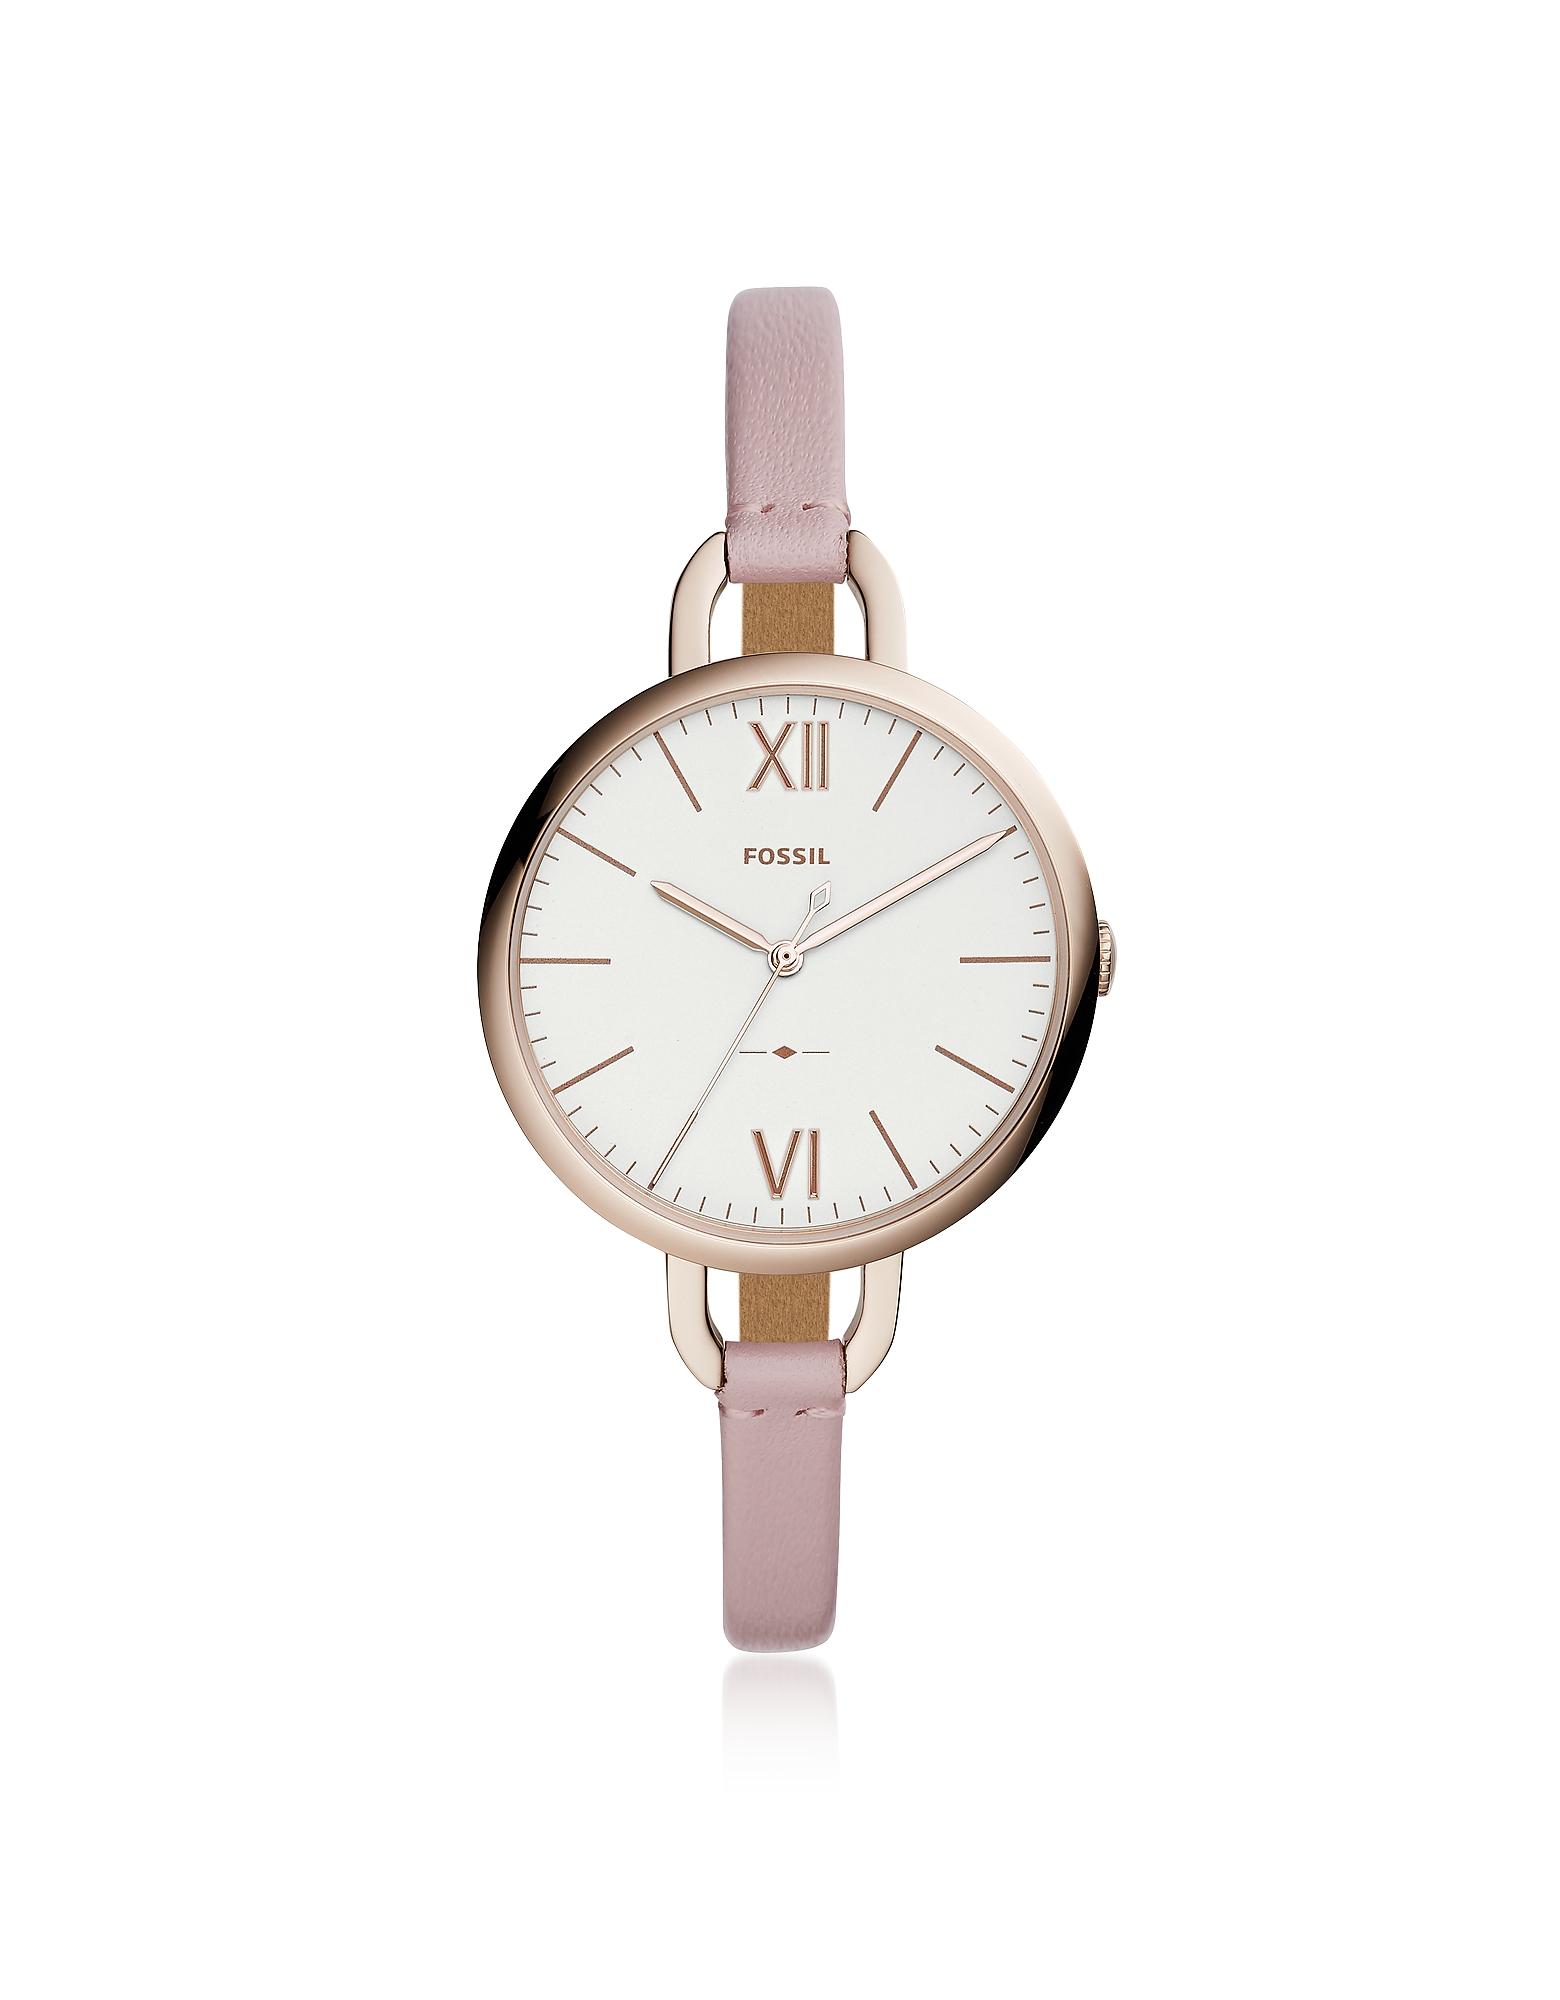 Трехстрелочные Часы Annette на Светло-розовом Кожаном Ремешке Fossil